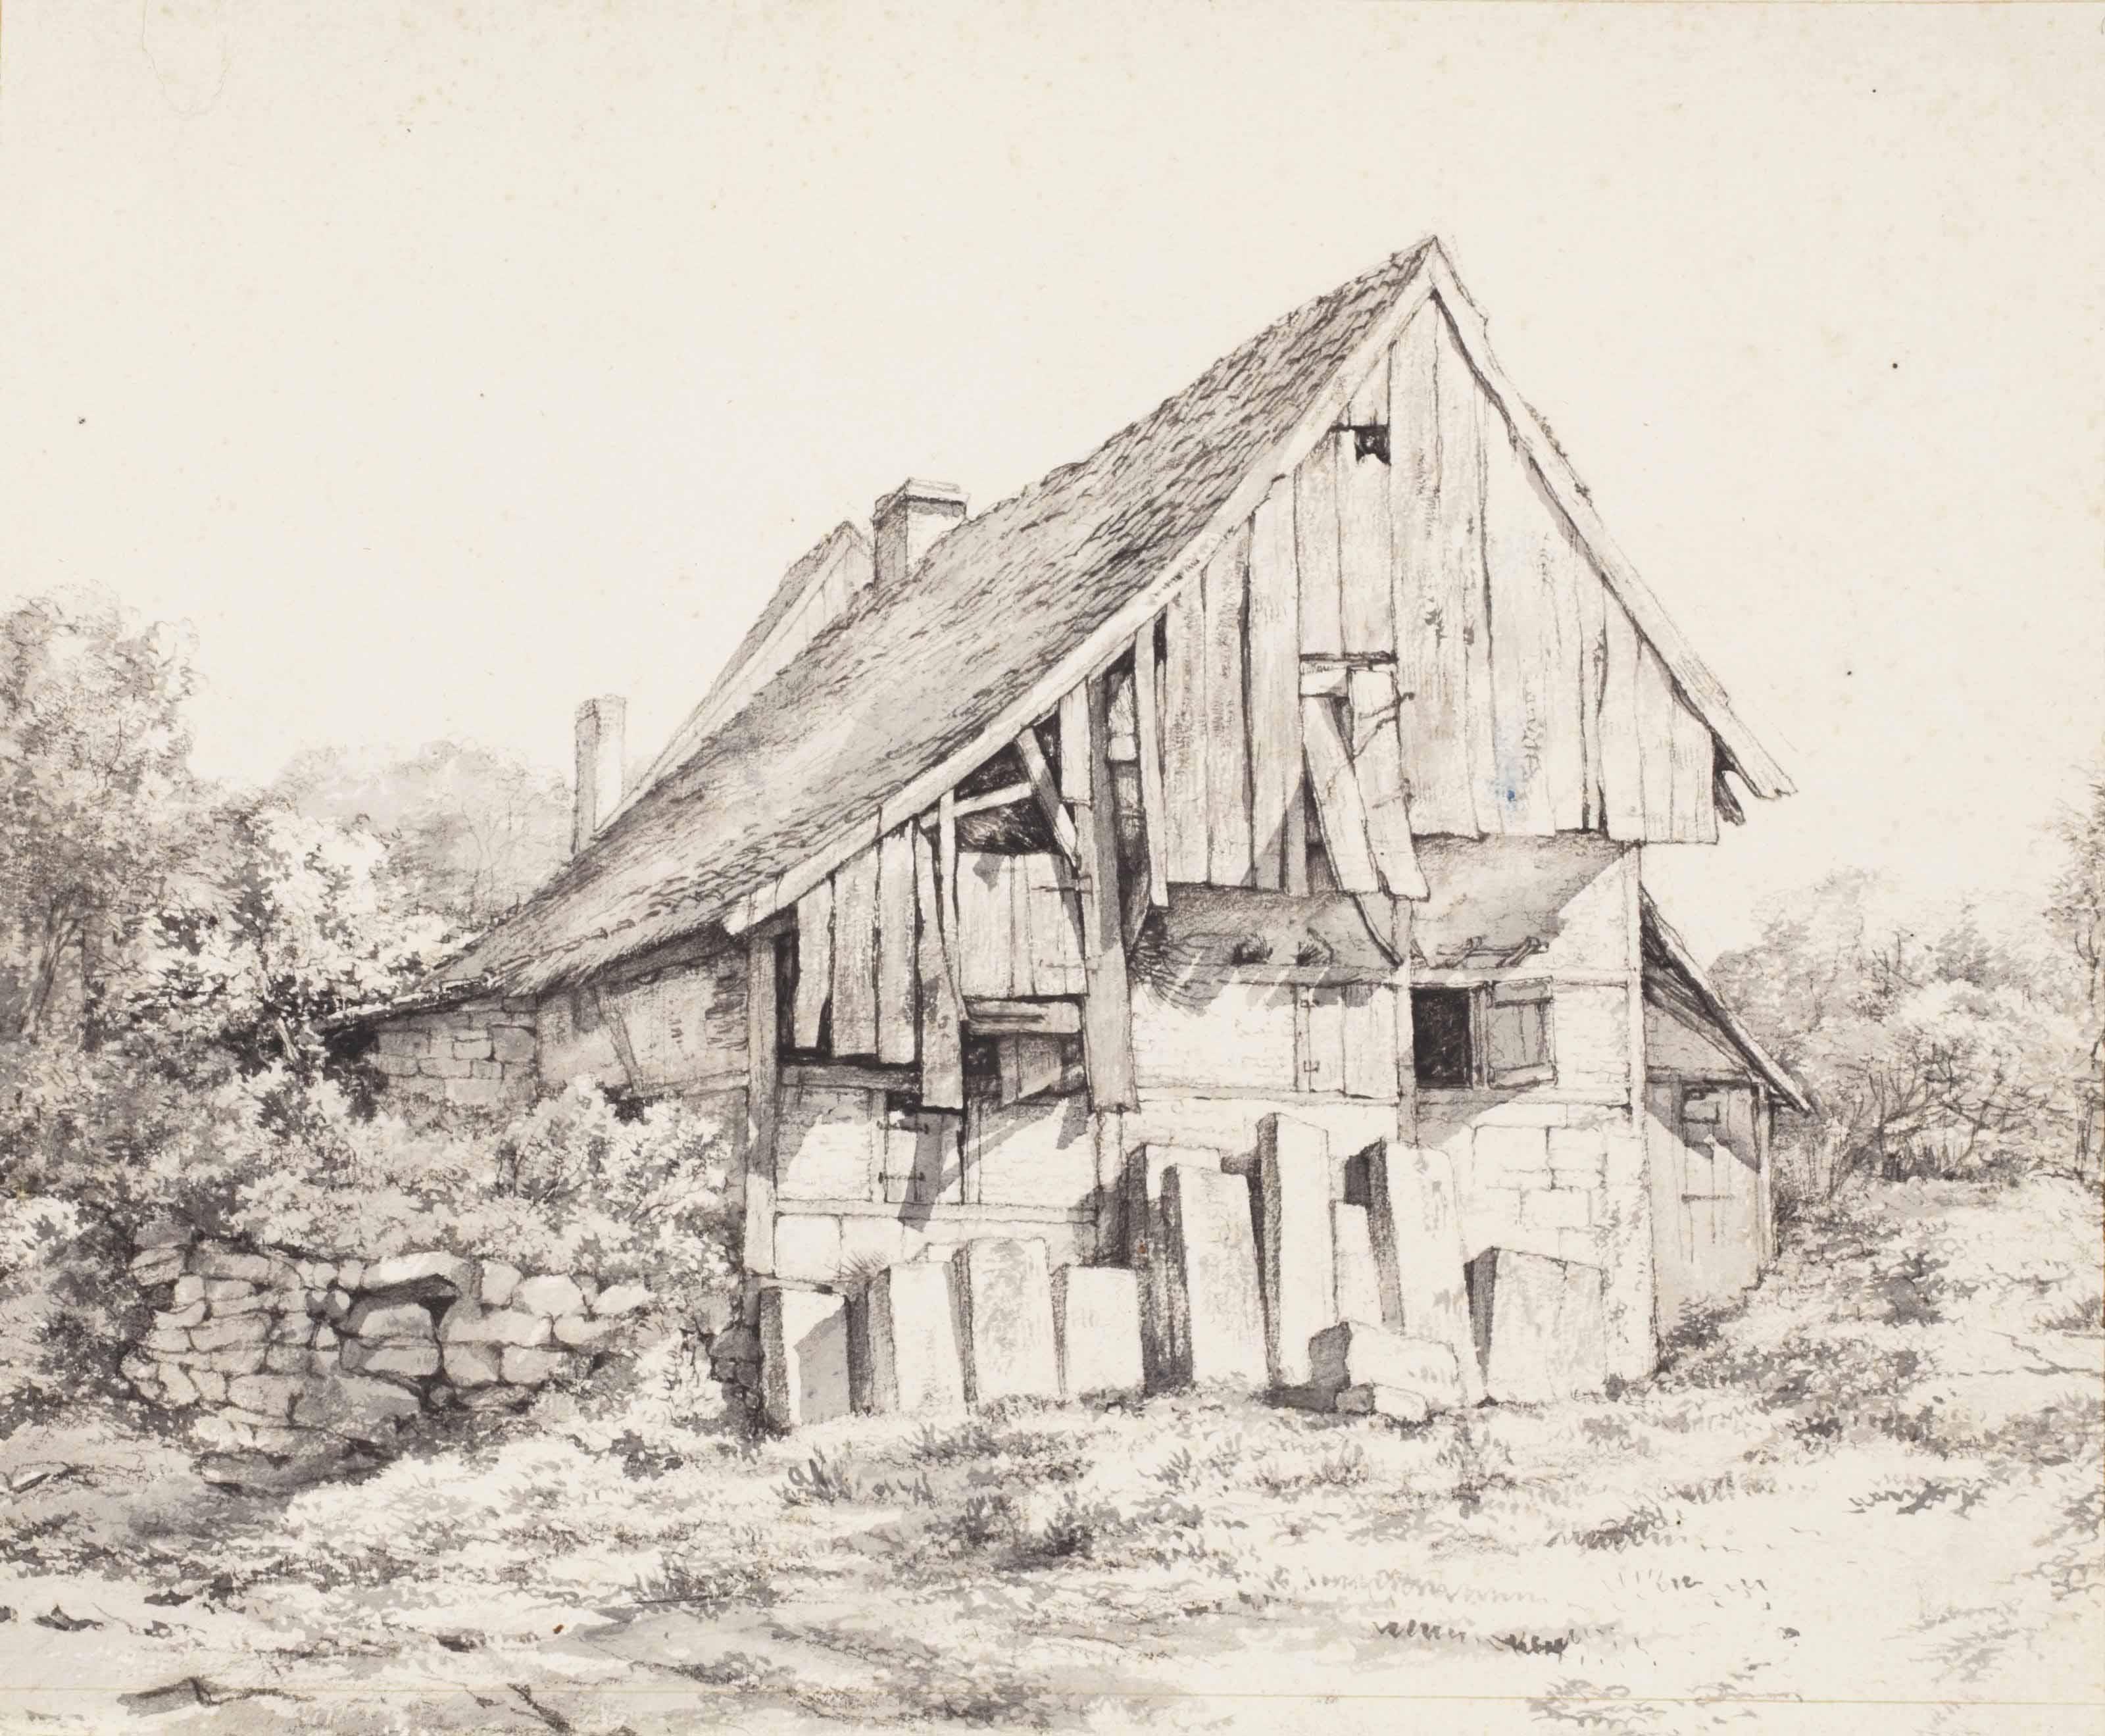 Albertus Brondgeest (Amsterdam 1786-1849)